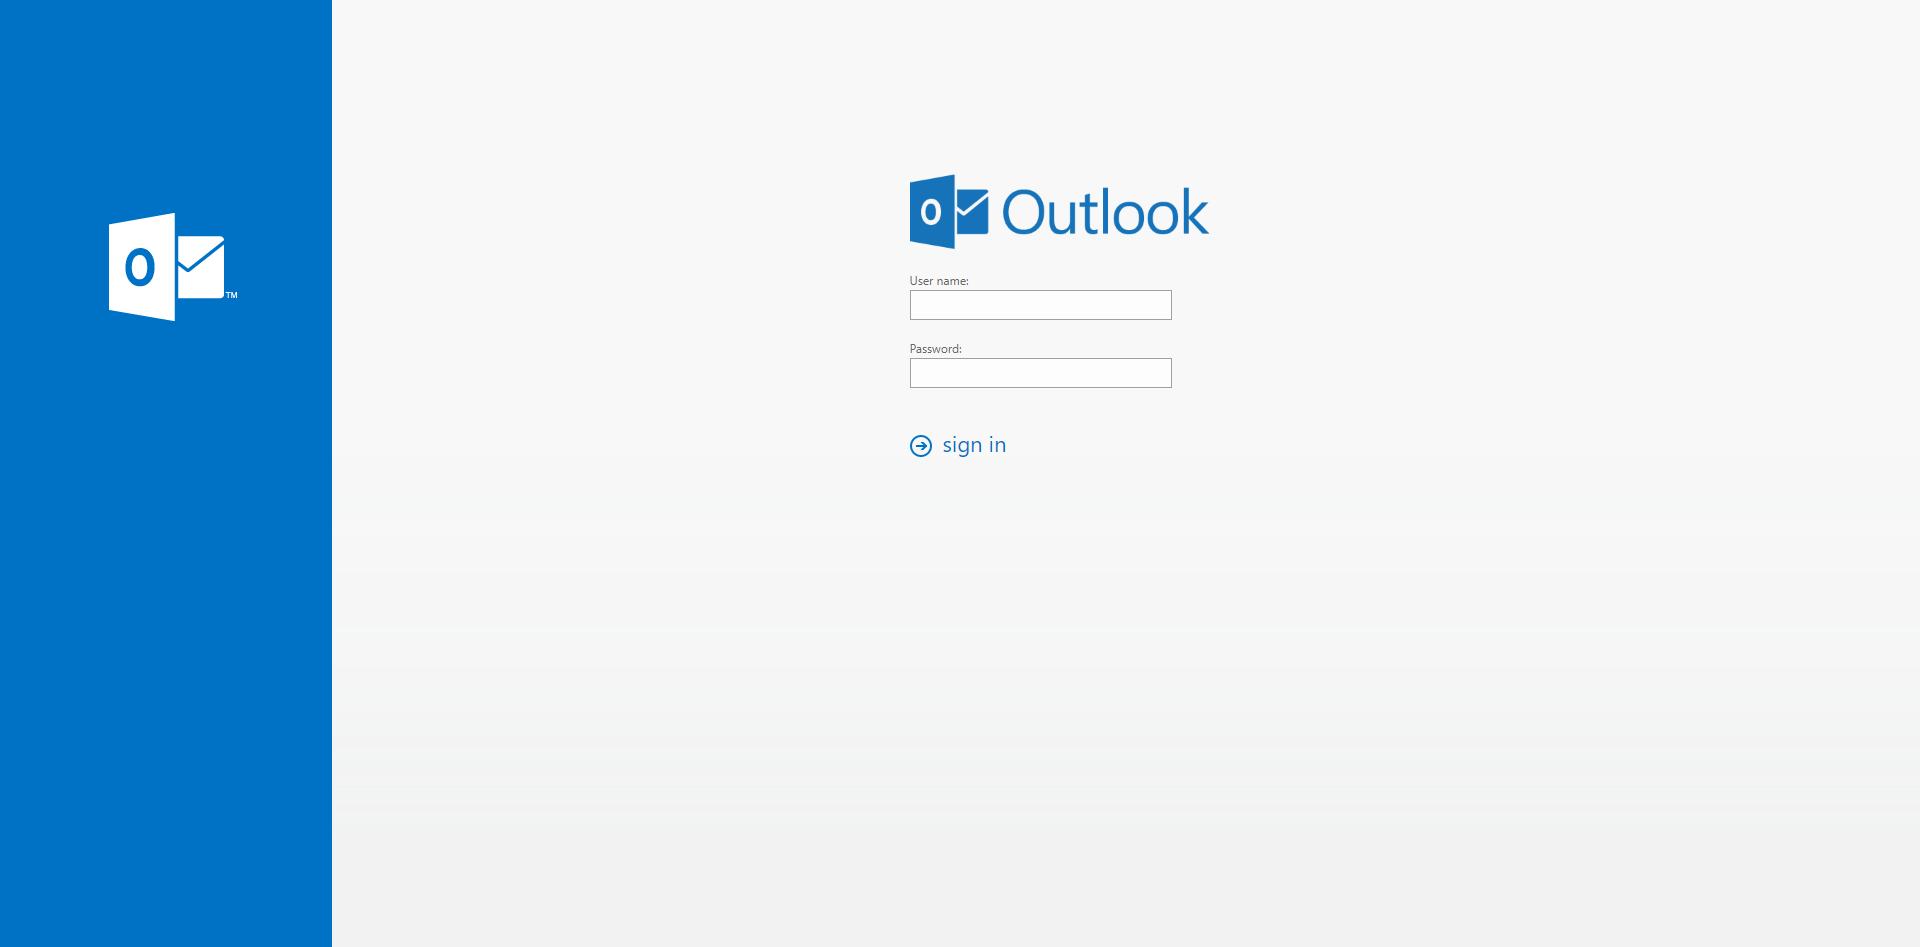 GitHub - cyruscook/PhishingTemplates: A collection of